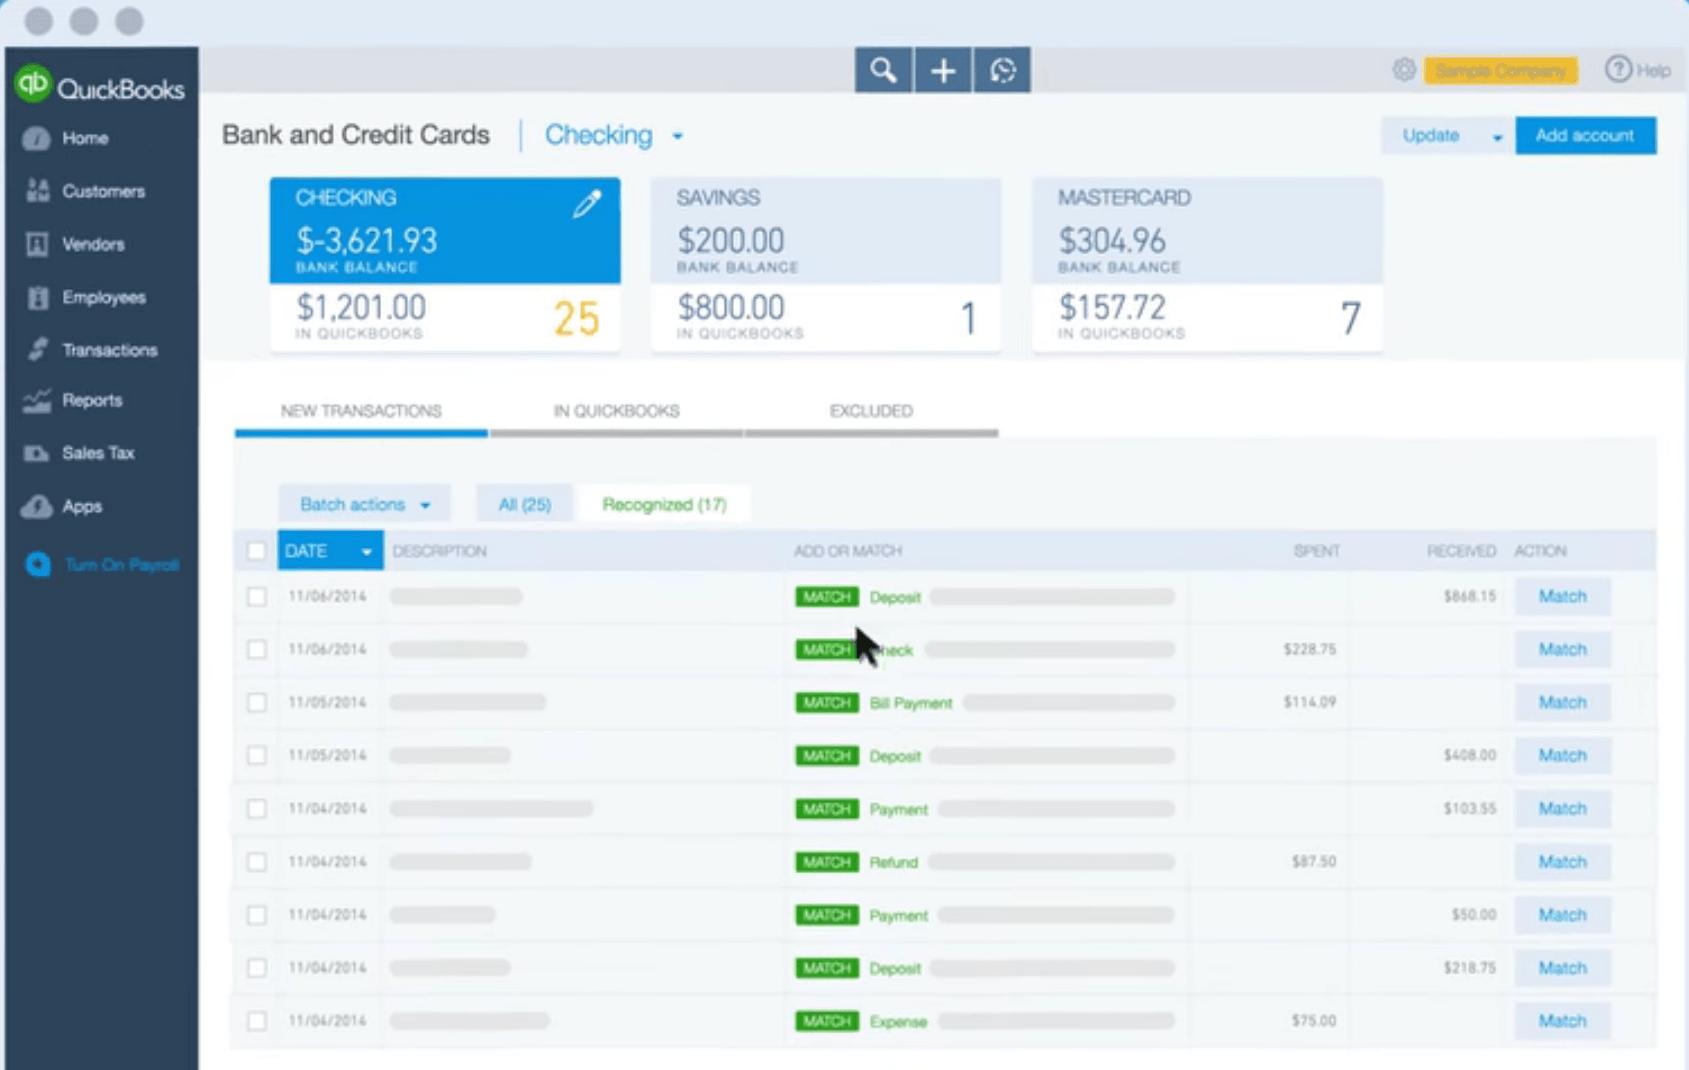 QuickBooks' bank account synchronization screen.